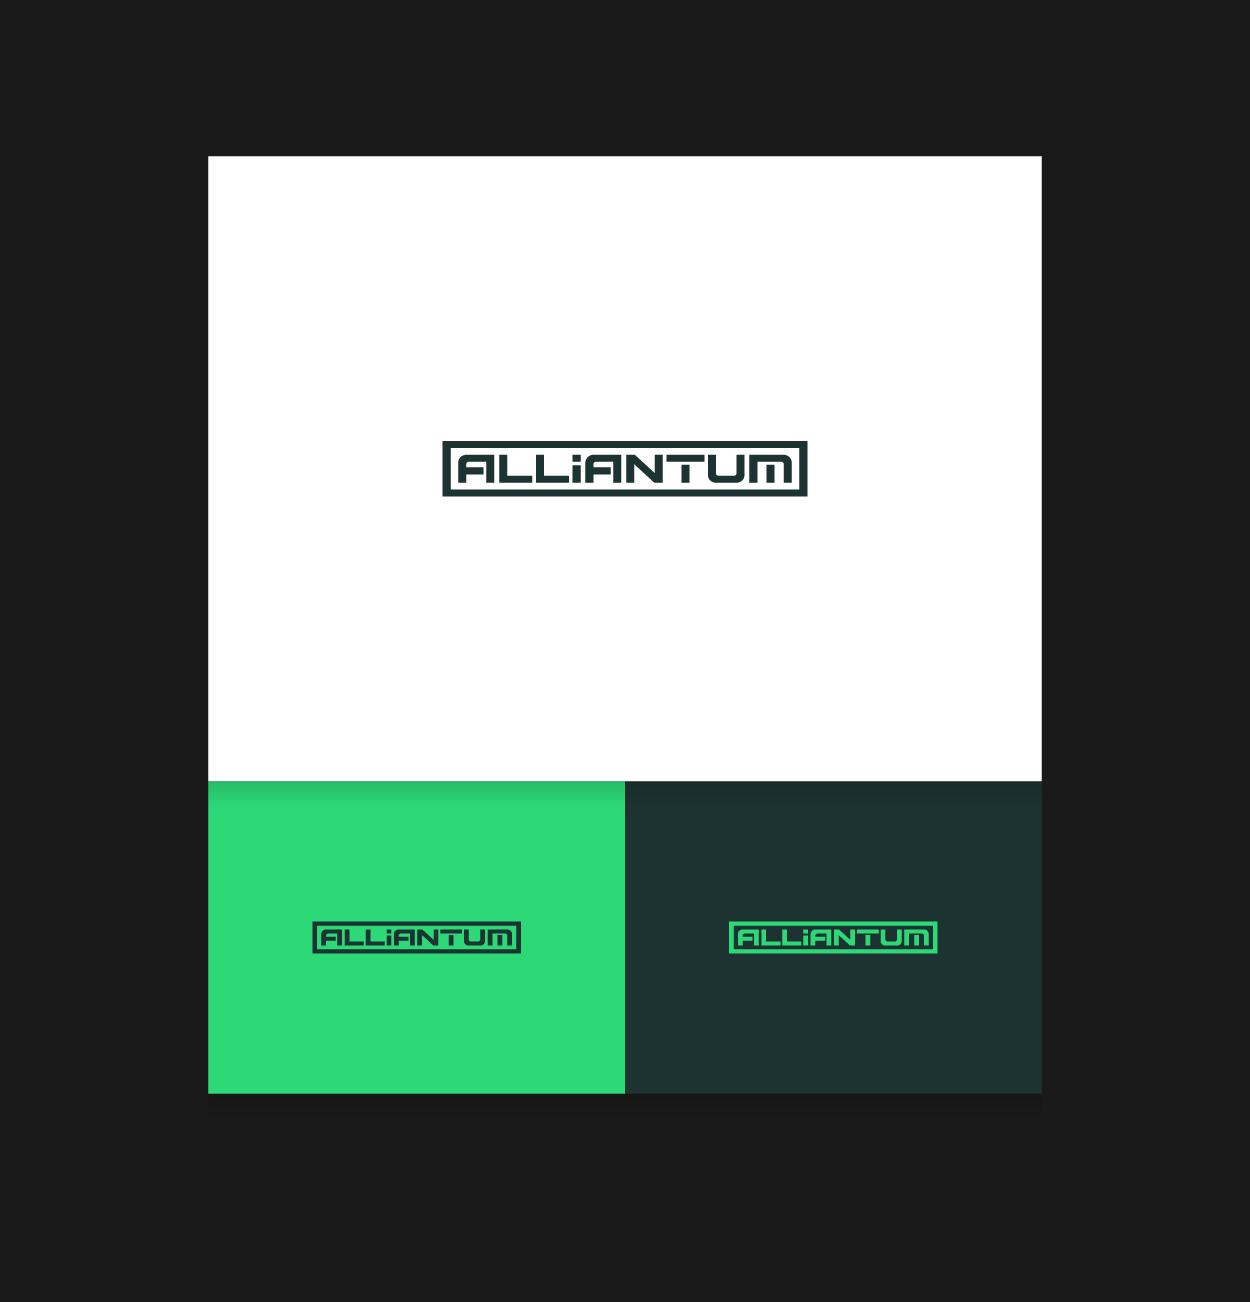 design #88 of Nuzzo